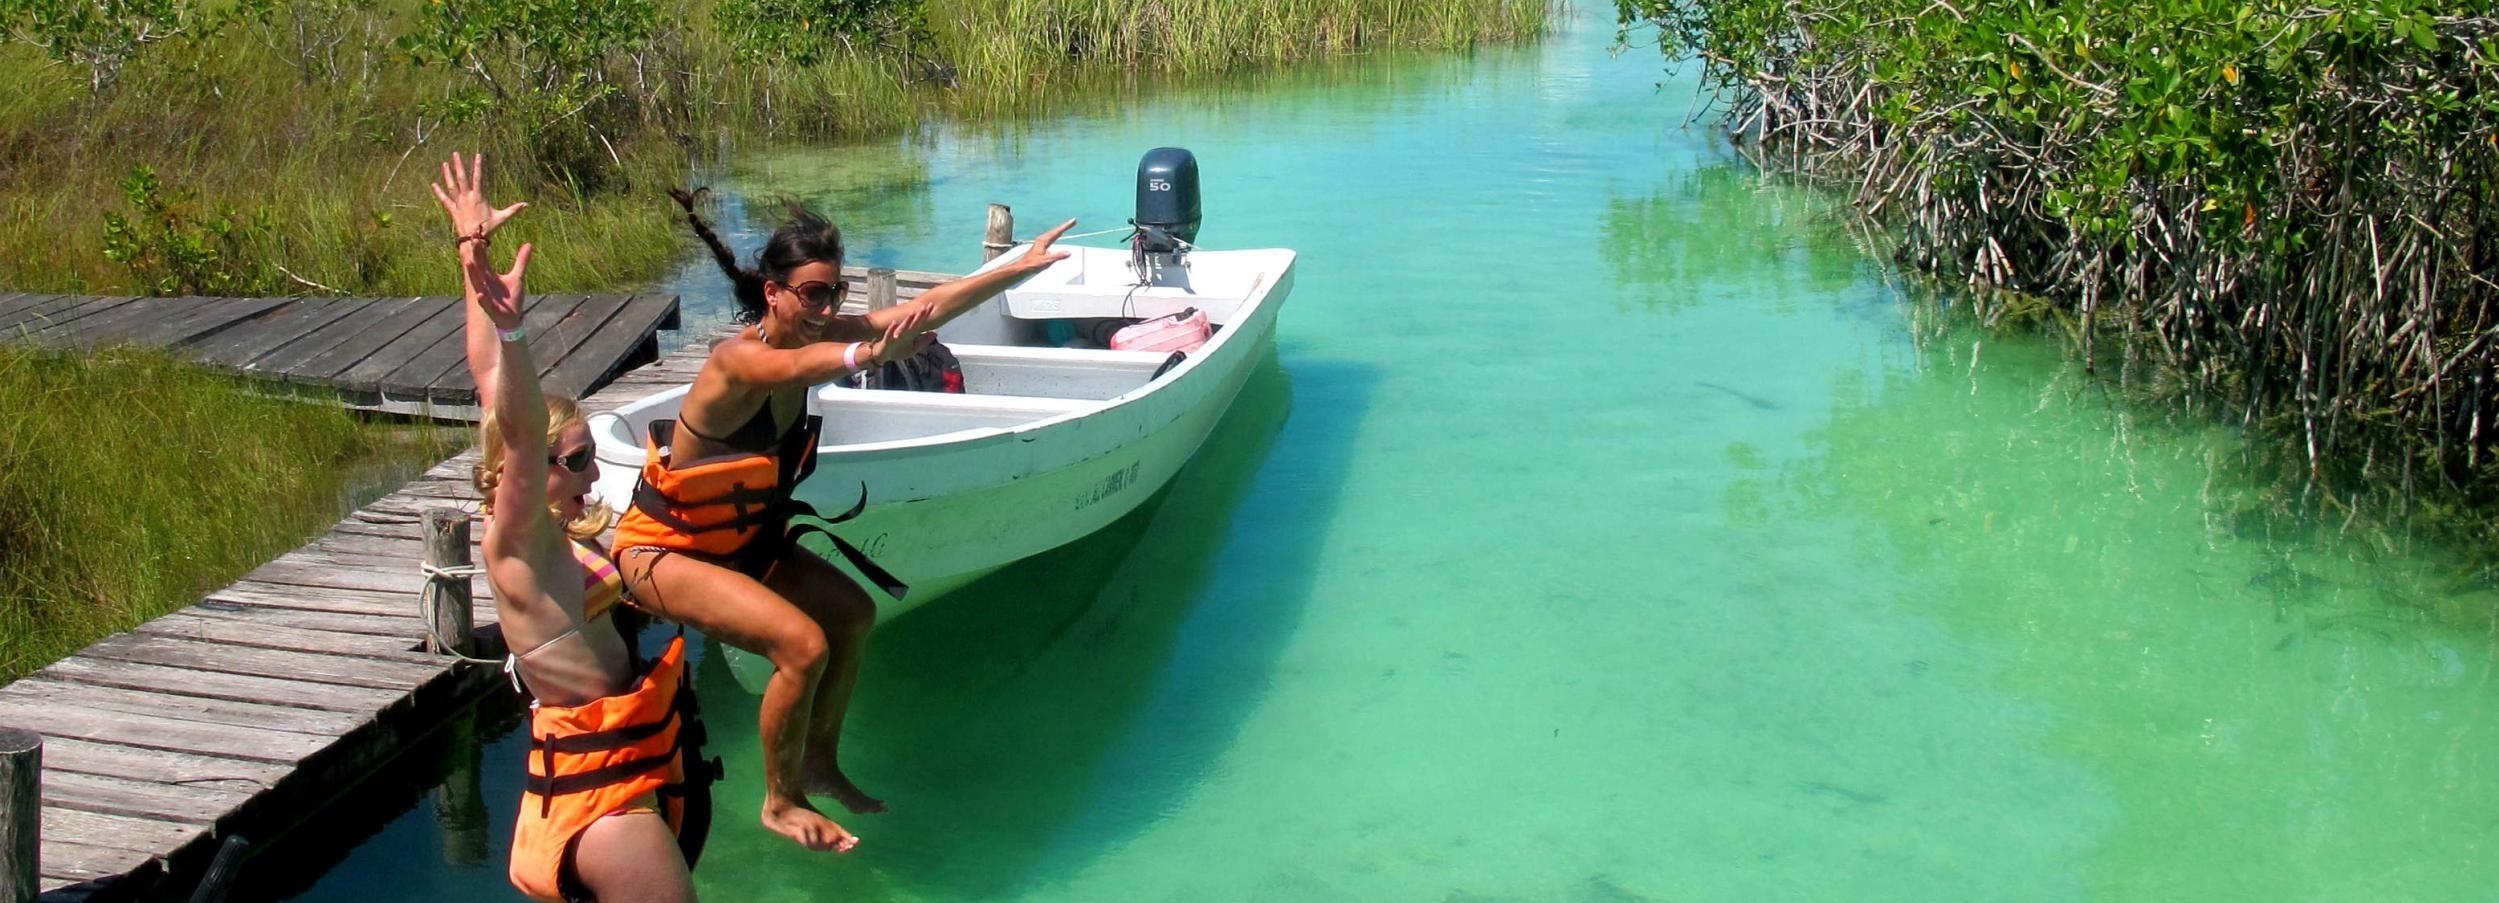 Tulum: lagunas de Sian Kaan y cenote Escondido